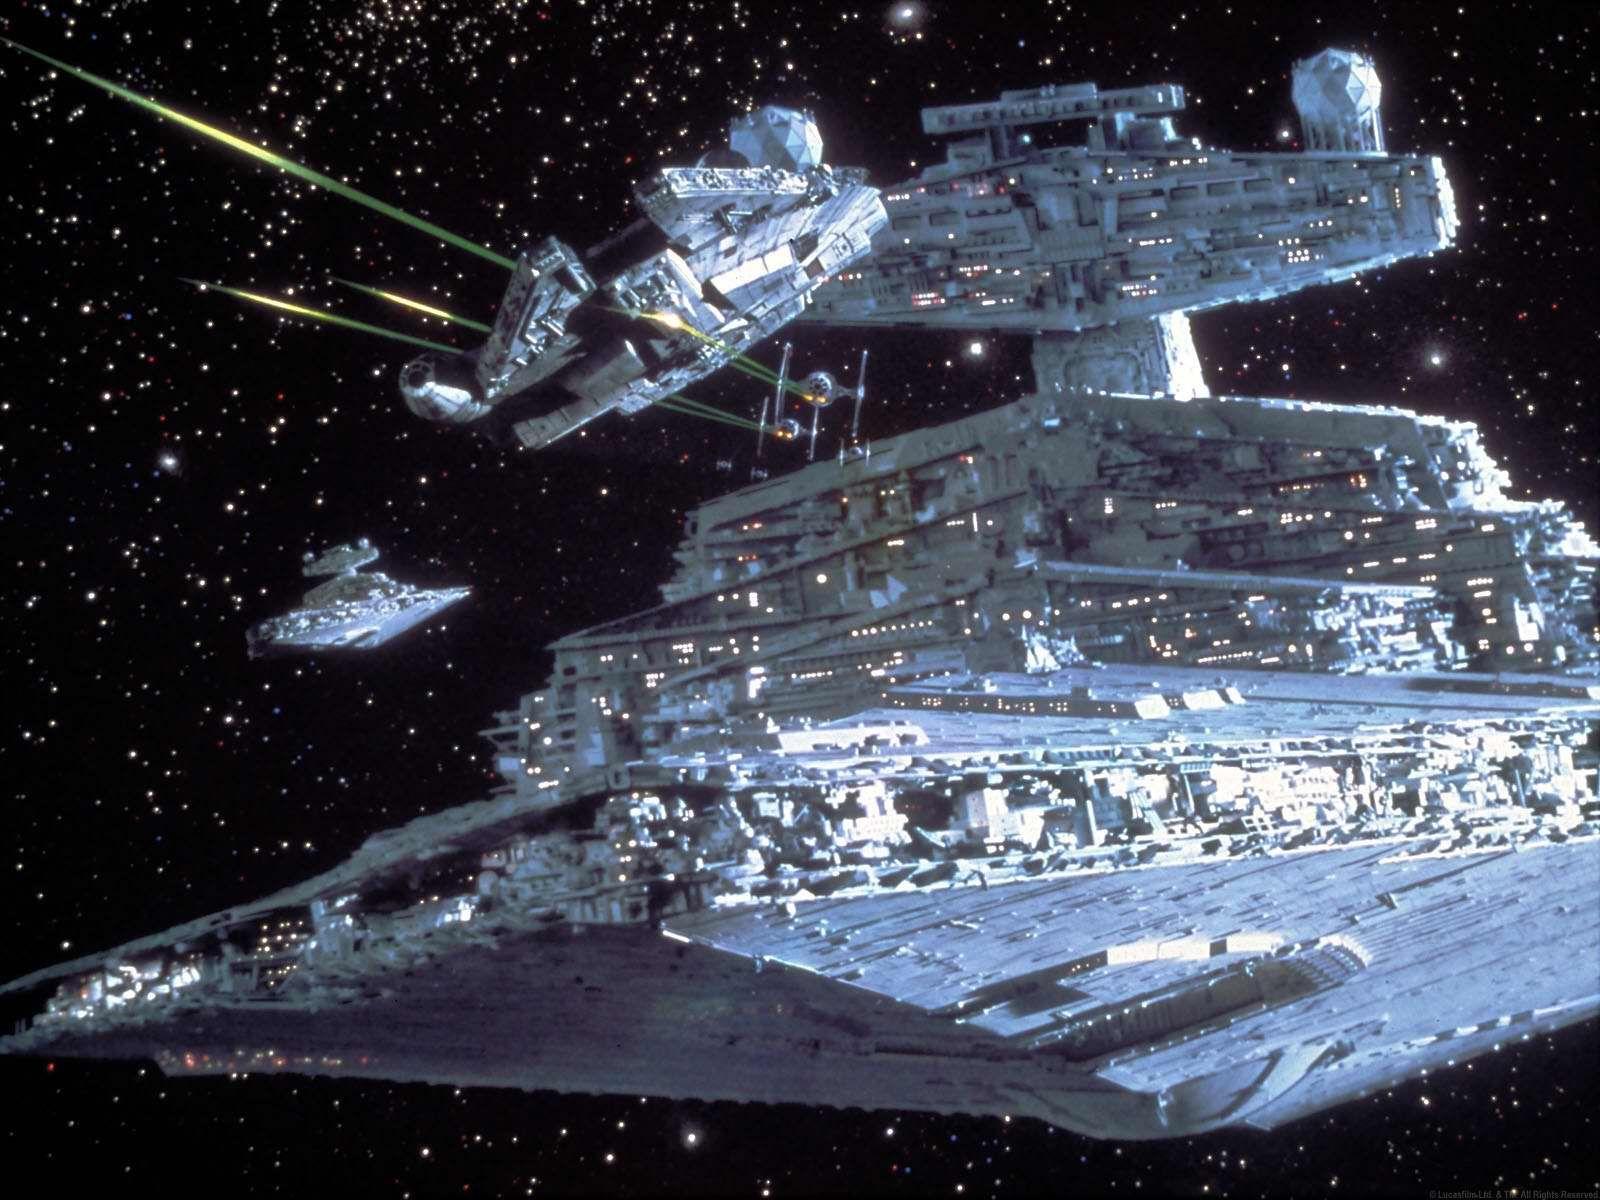 star wars millenium falcon - photo #5